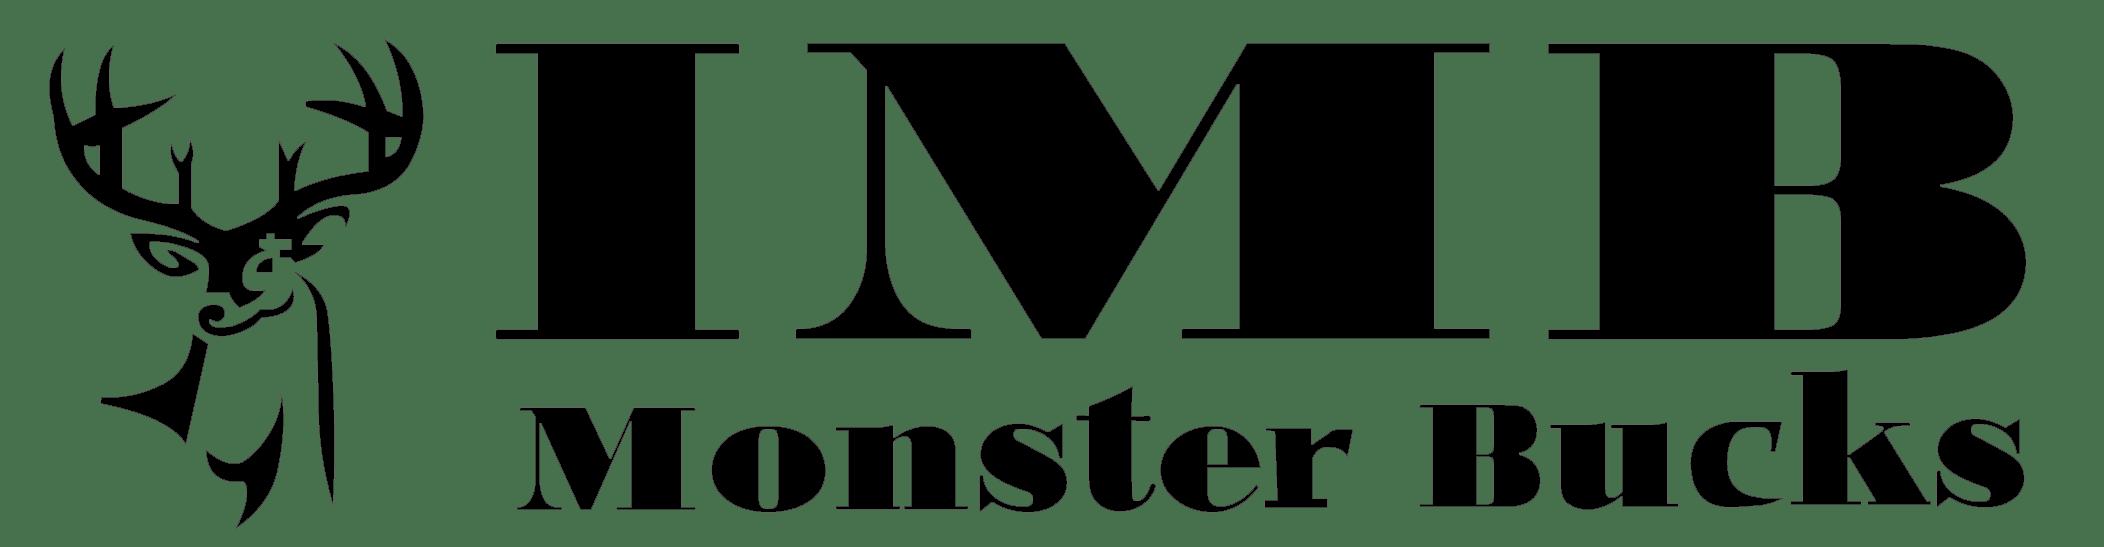 IMB Monster Bucks